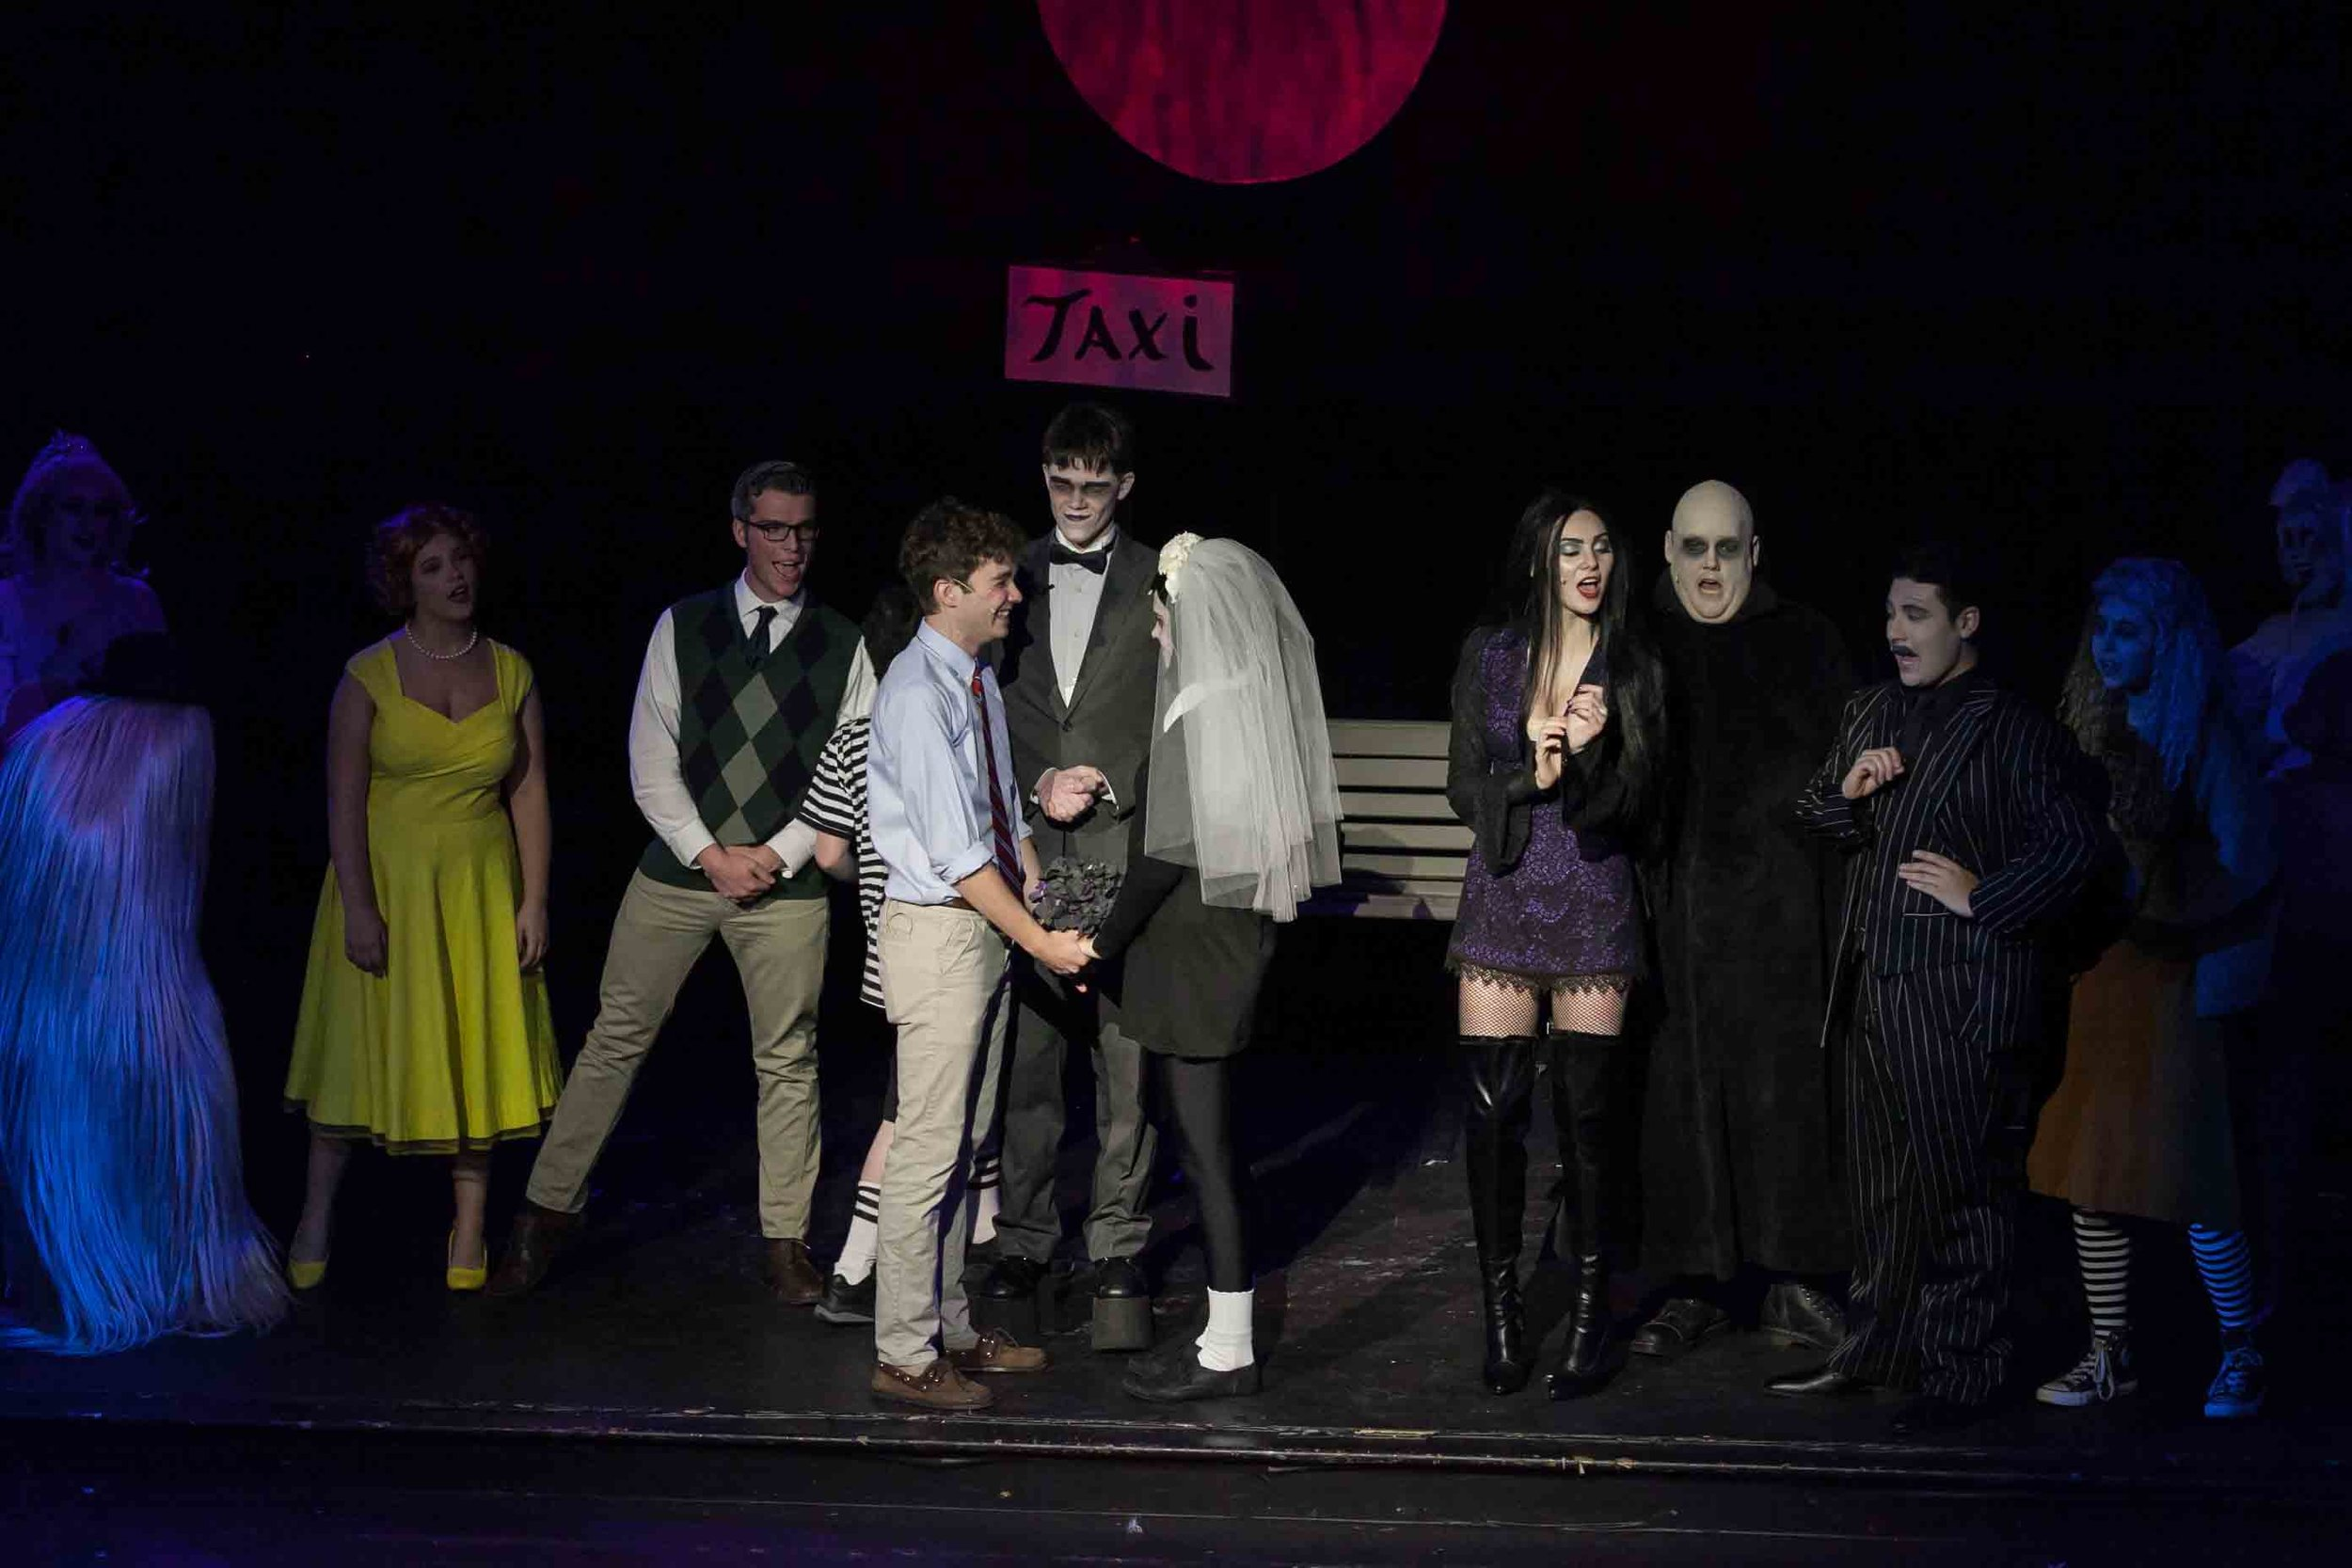 6-19-16 Addams Family Kooky Cast 0443.jpg